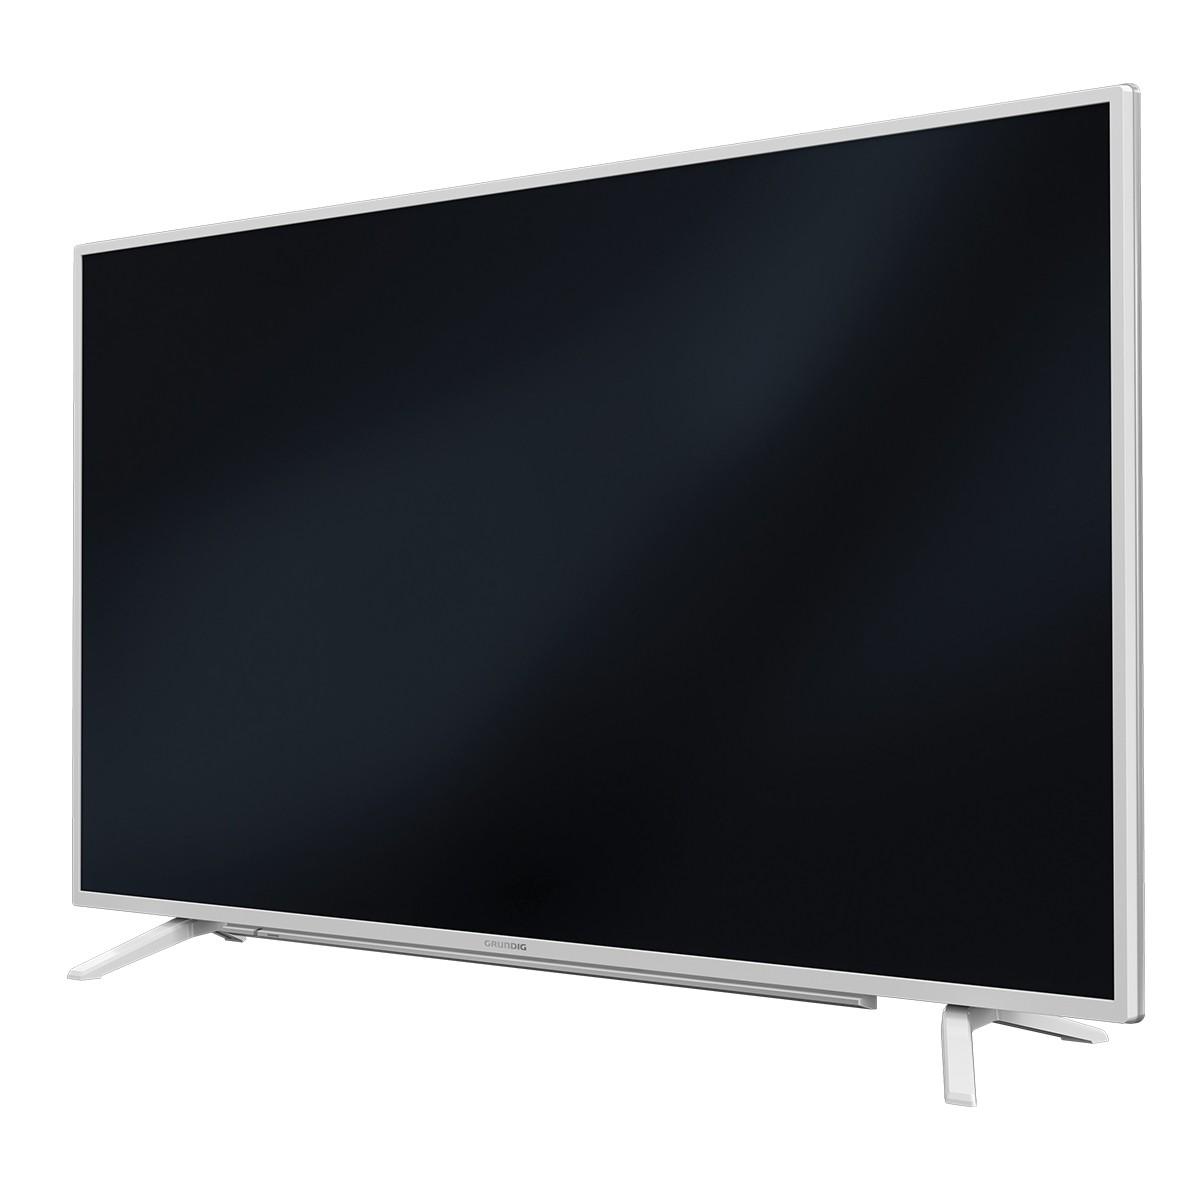 TV-Geräte - TV - Medientechnik - DynaTech